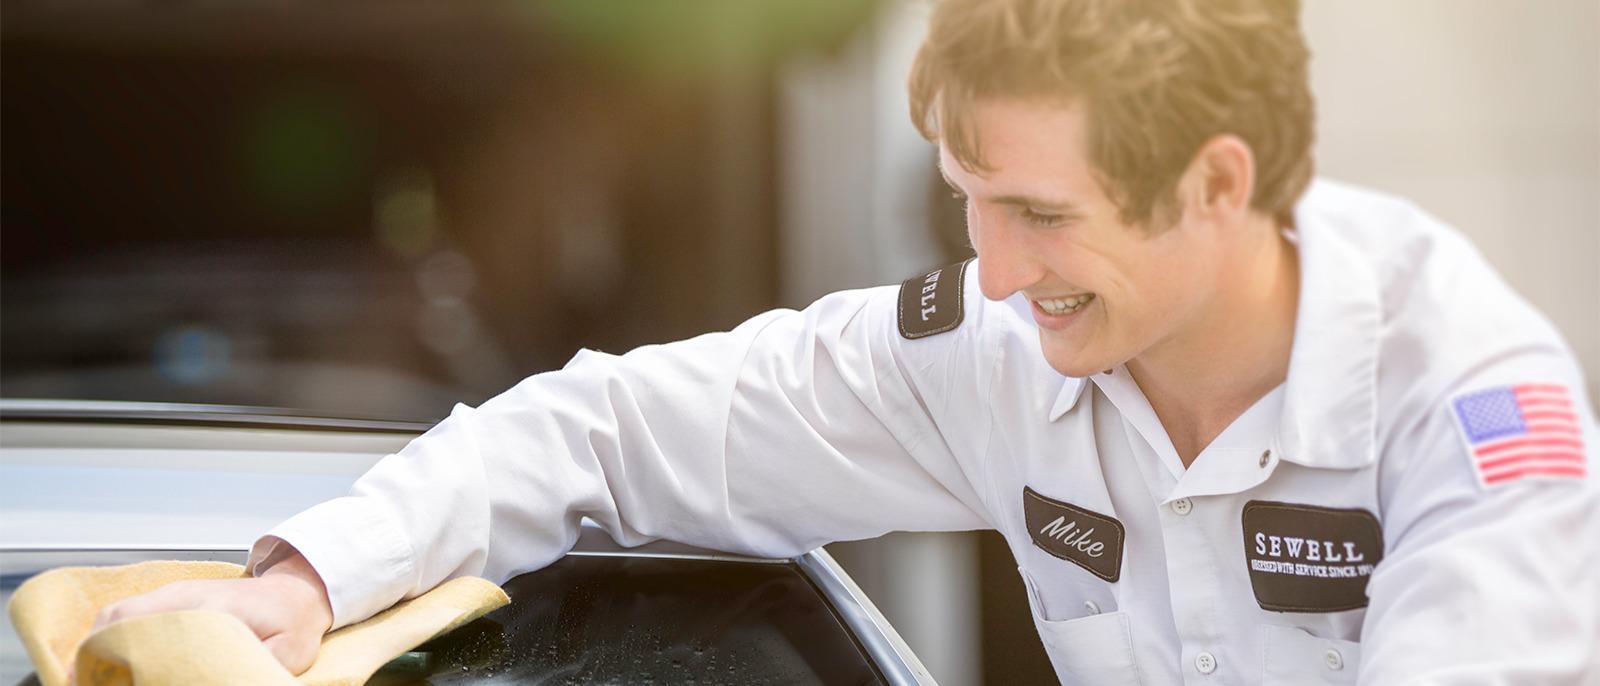 Sewell employee washing a car